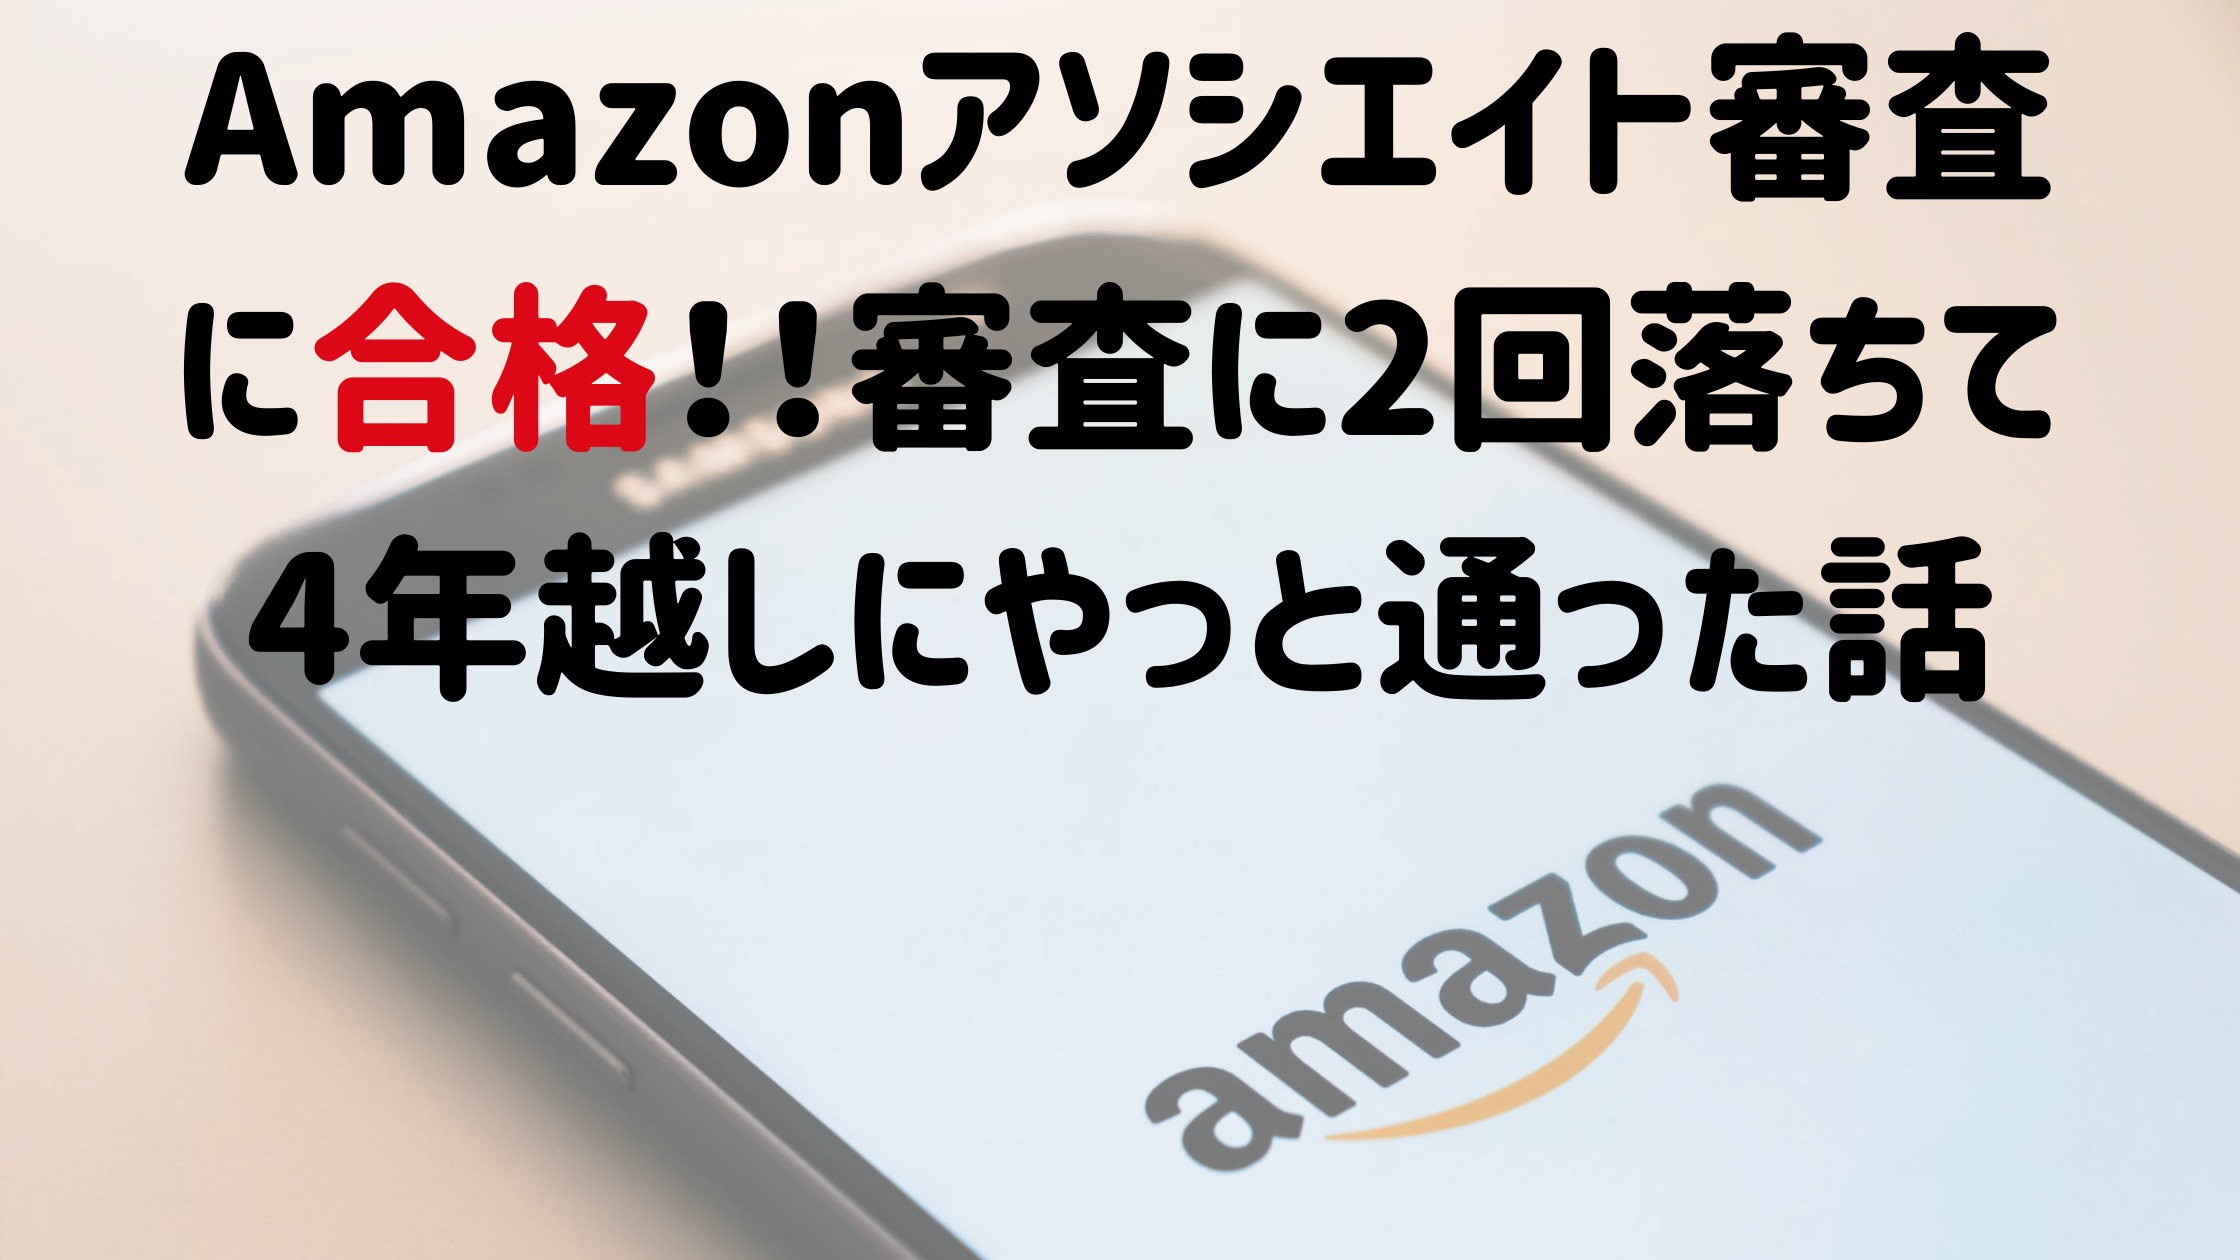 amazonアソシエイト 審査 報酬 落ちた 登録方法 3件 何日 結果 条件 通らない自分で買うのはNG 記事数